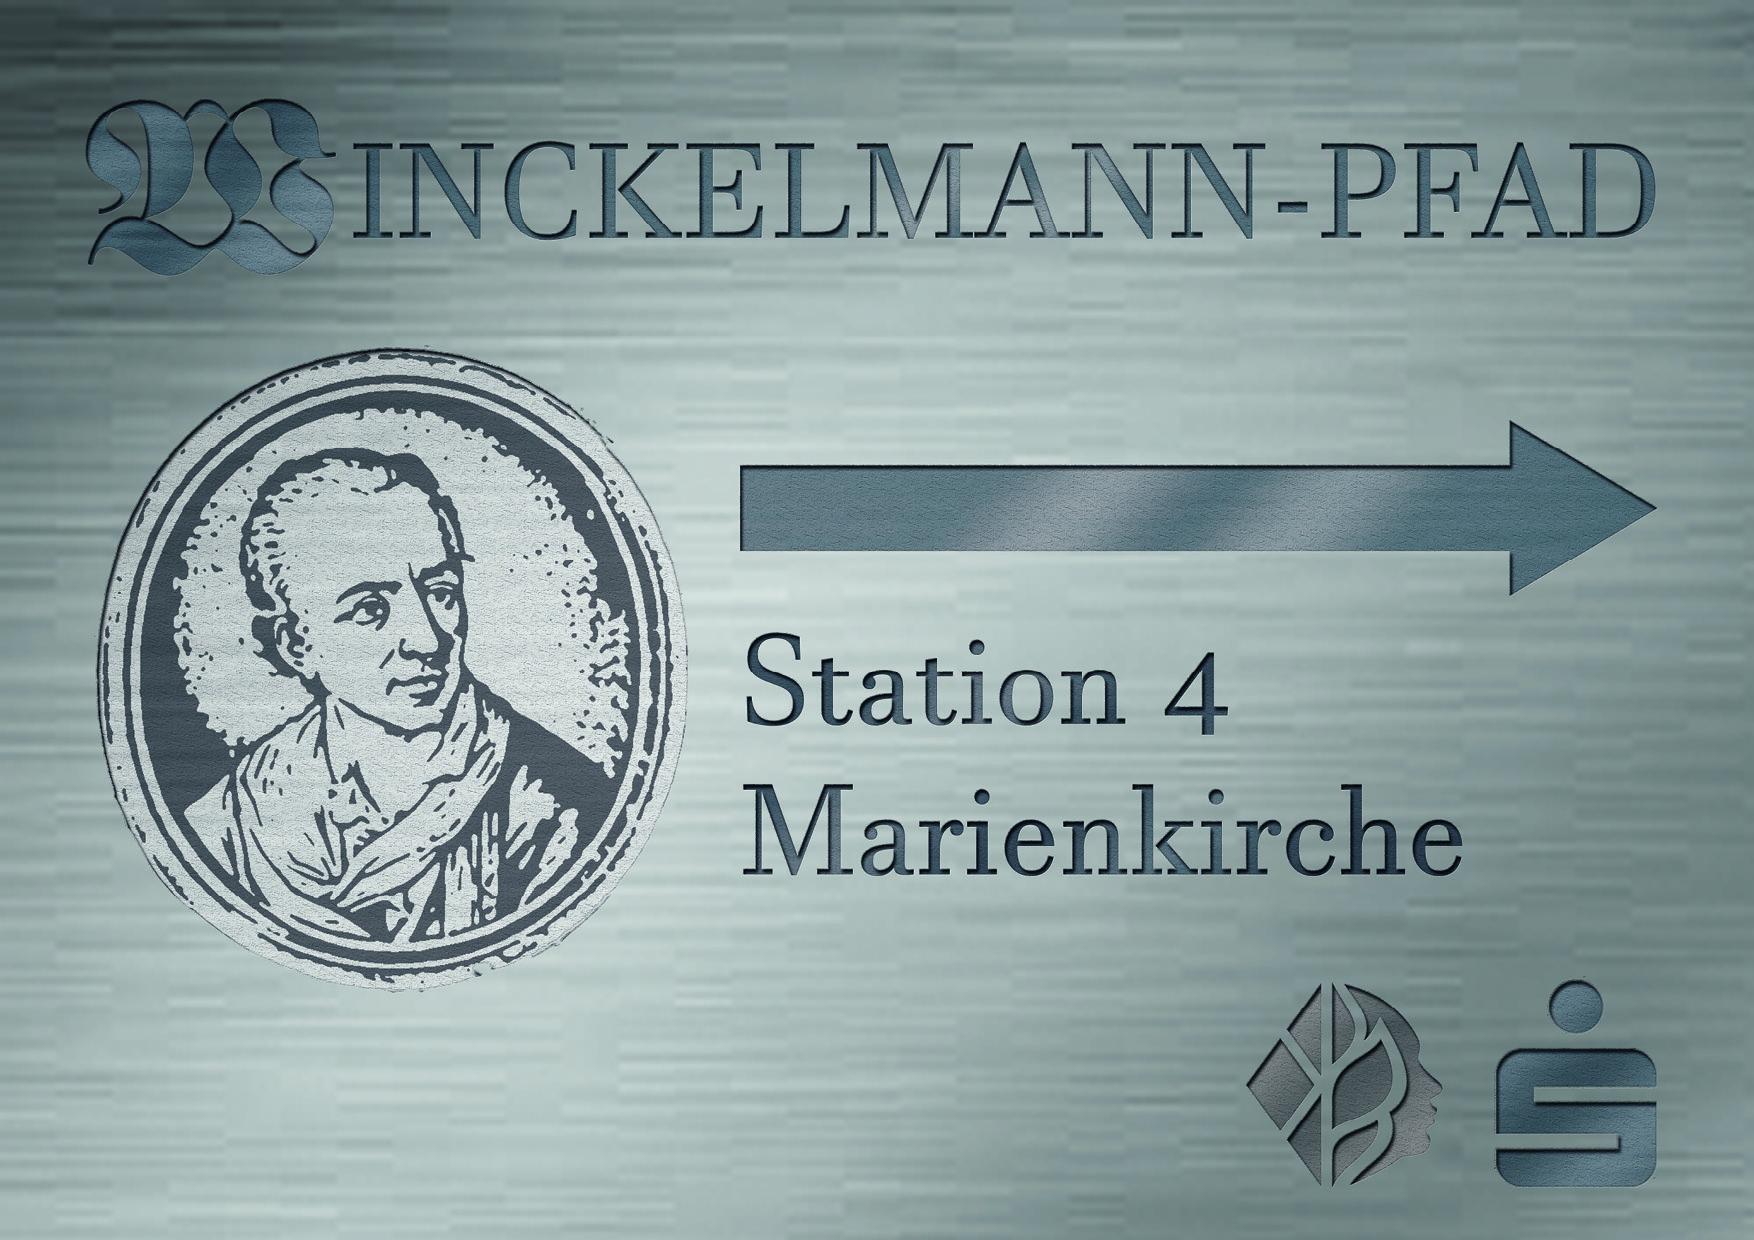 Winckelmann-Pfad Station 4